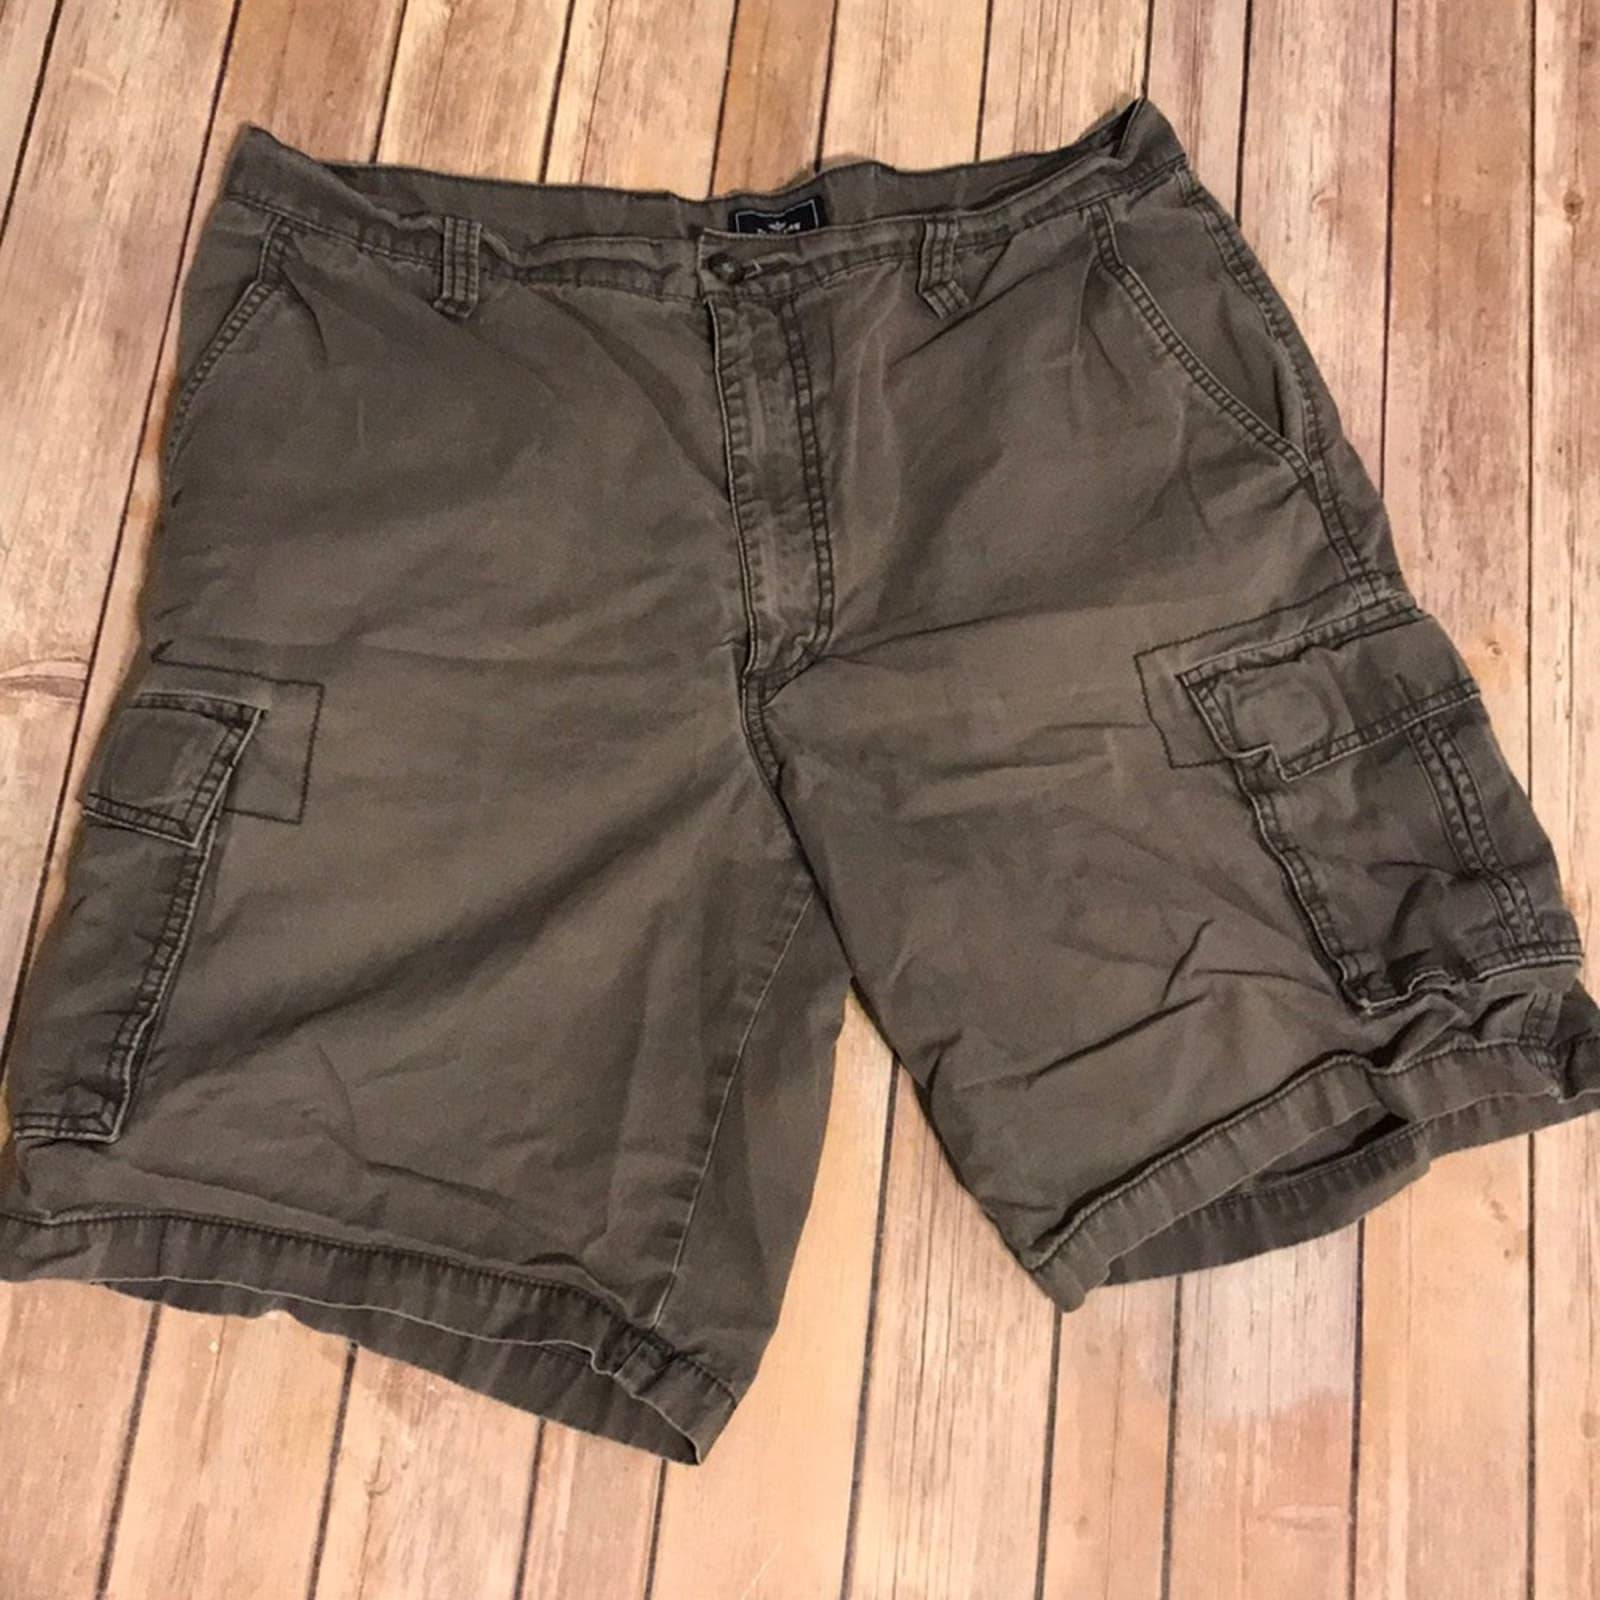 DOCKERS size 36 men's shorts